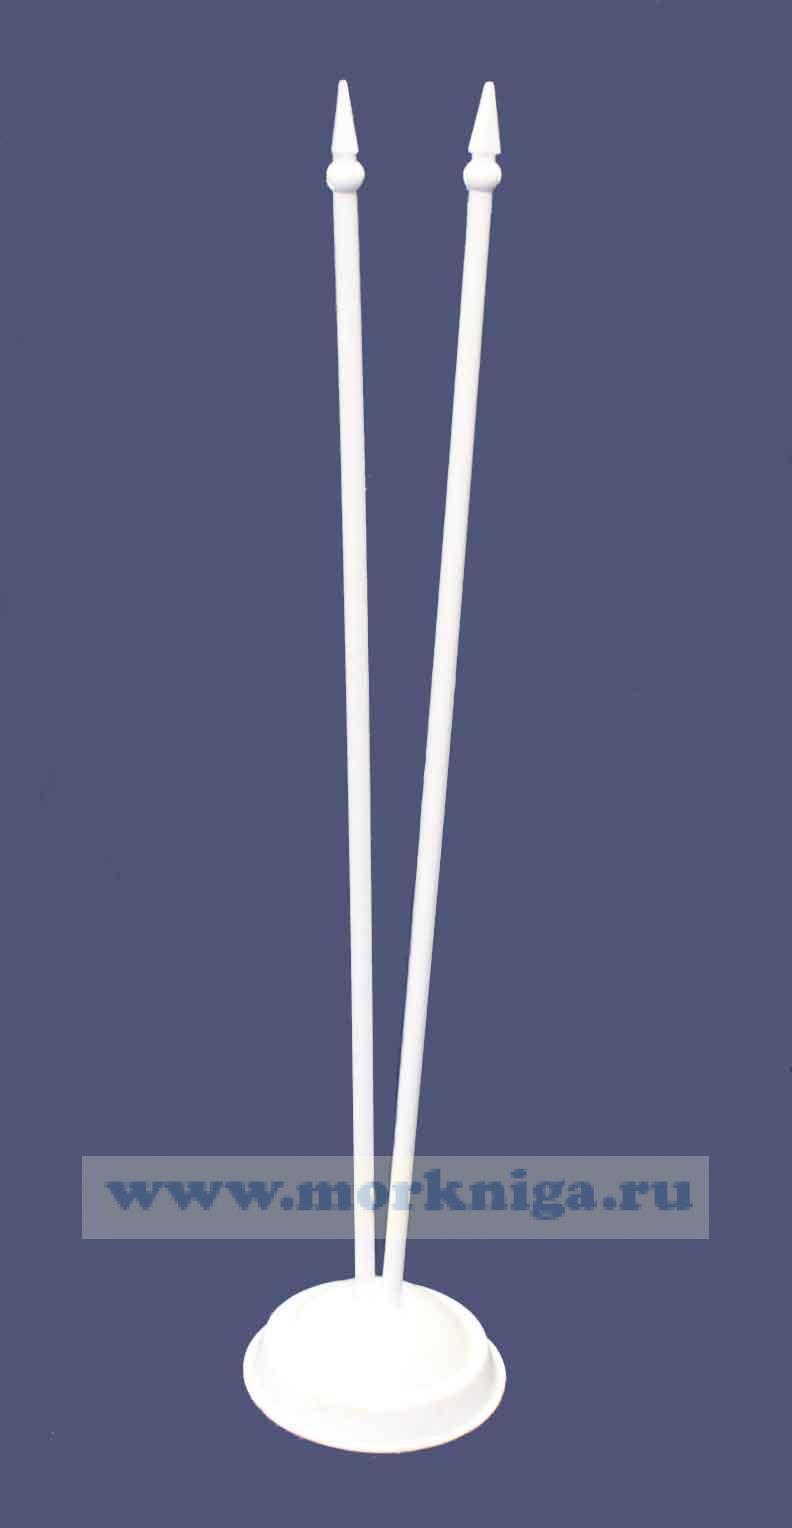 Древко-трубочка пластик на подставке (2 штока под сувенирный флаг 12*18 см)